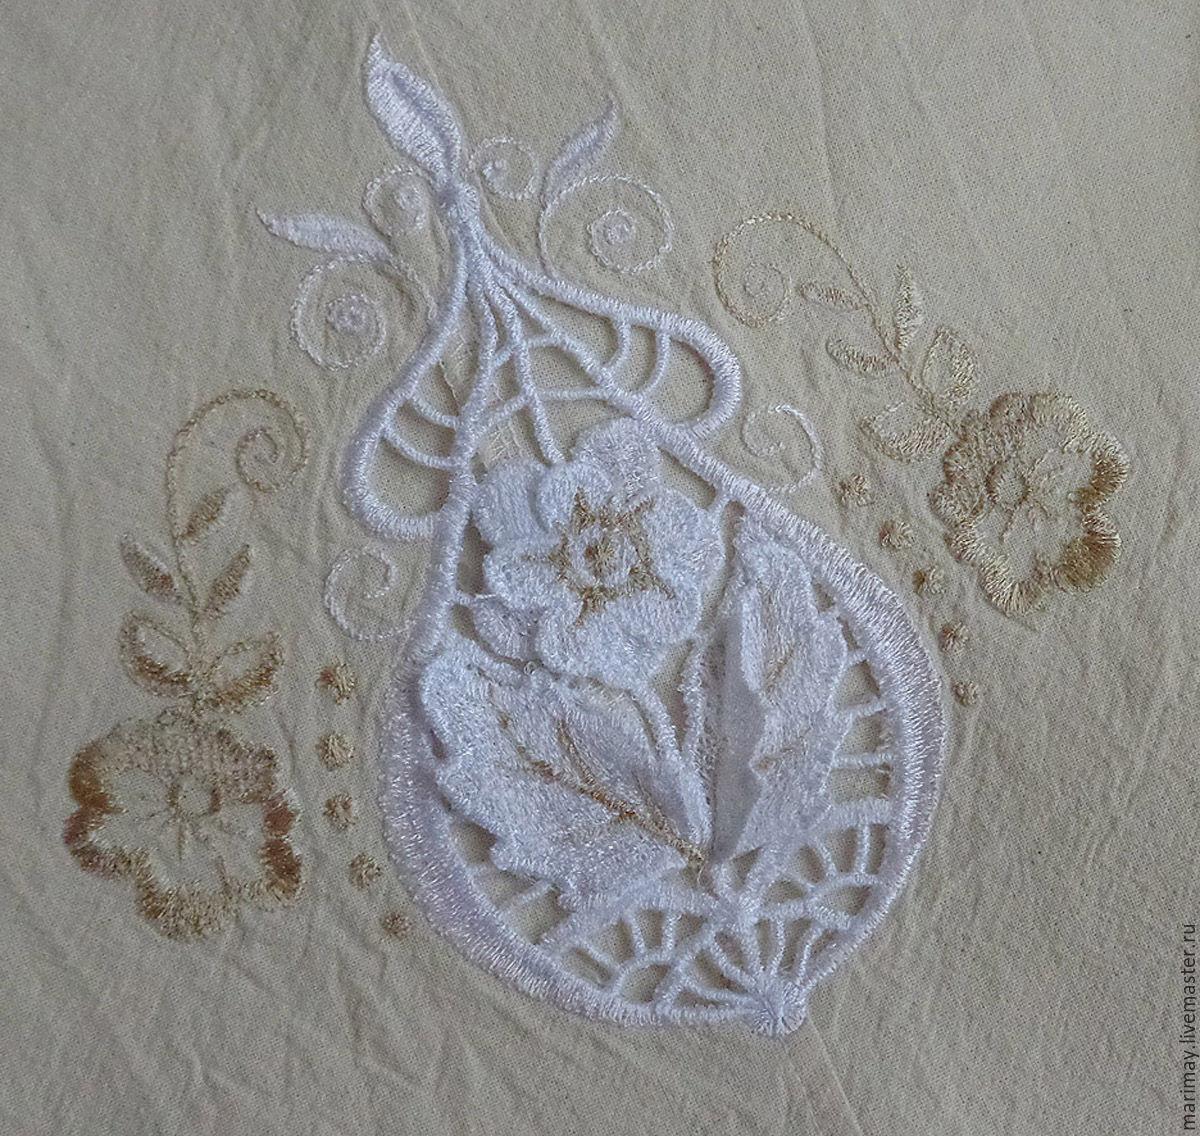 Дизайны к вышивке ришелье